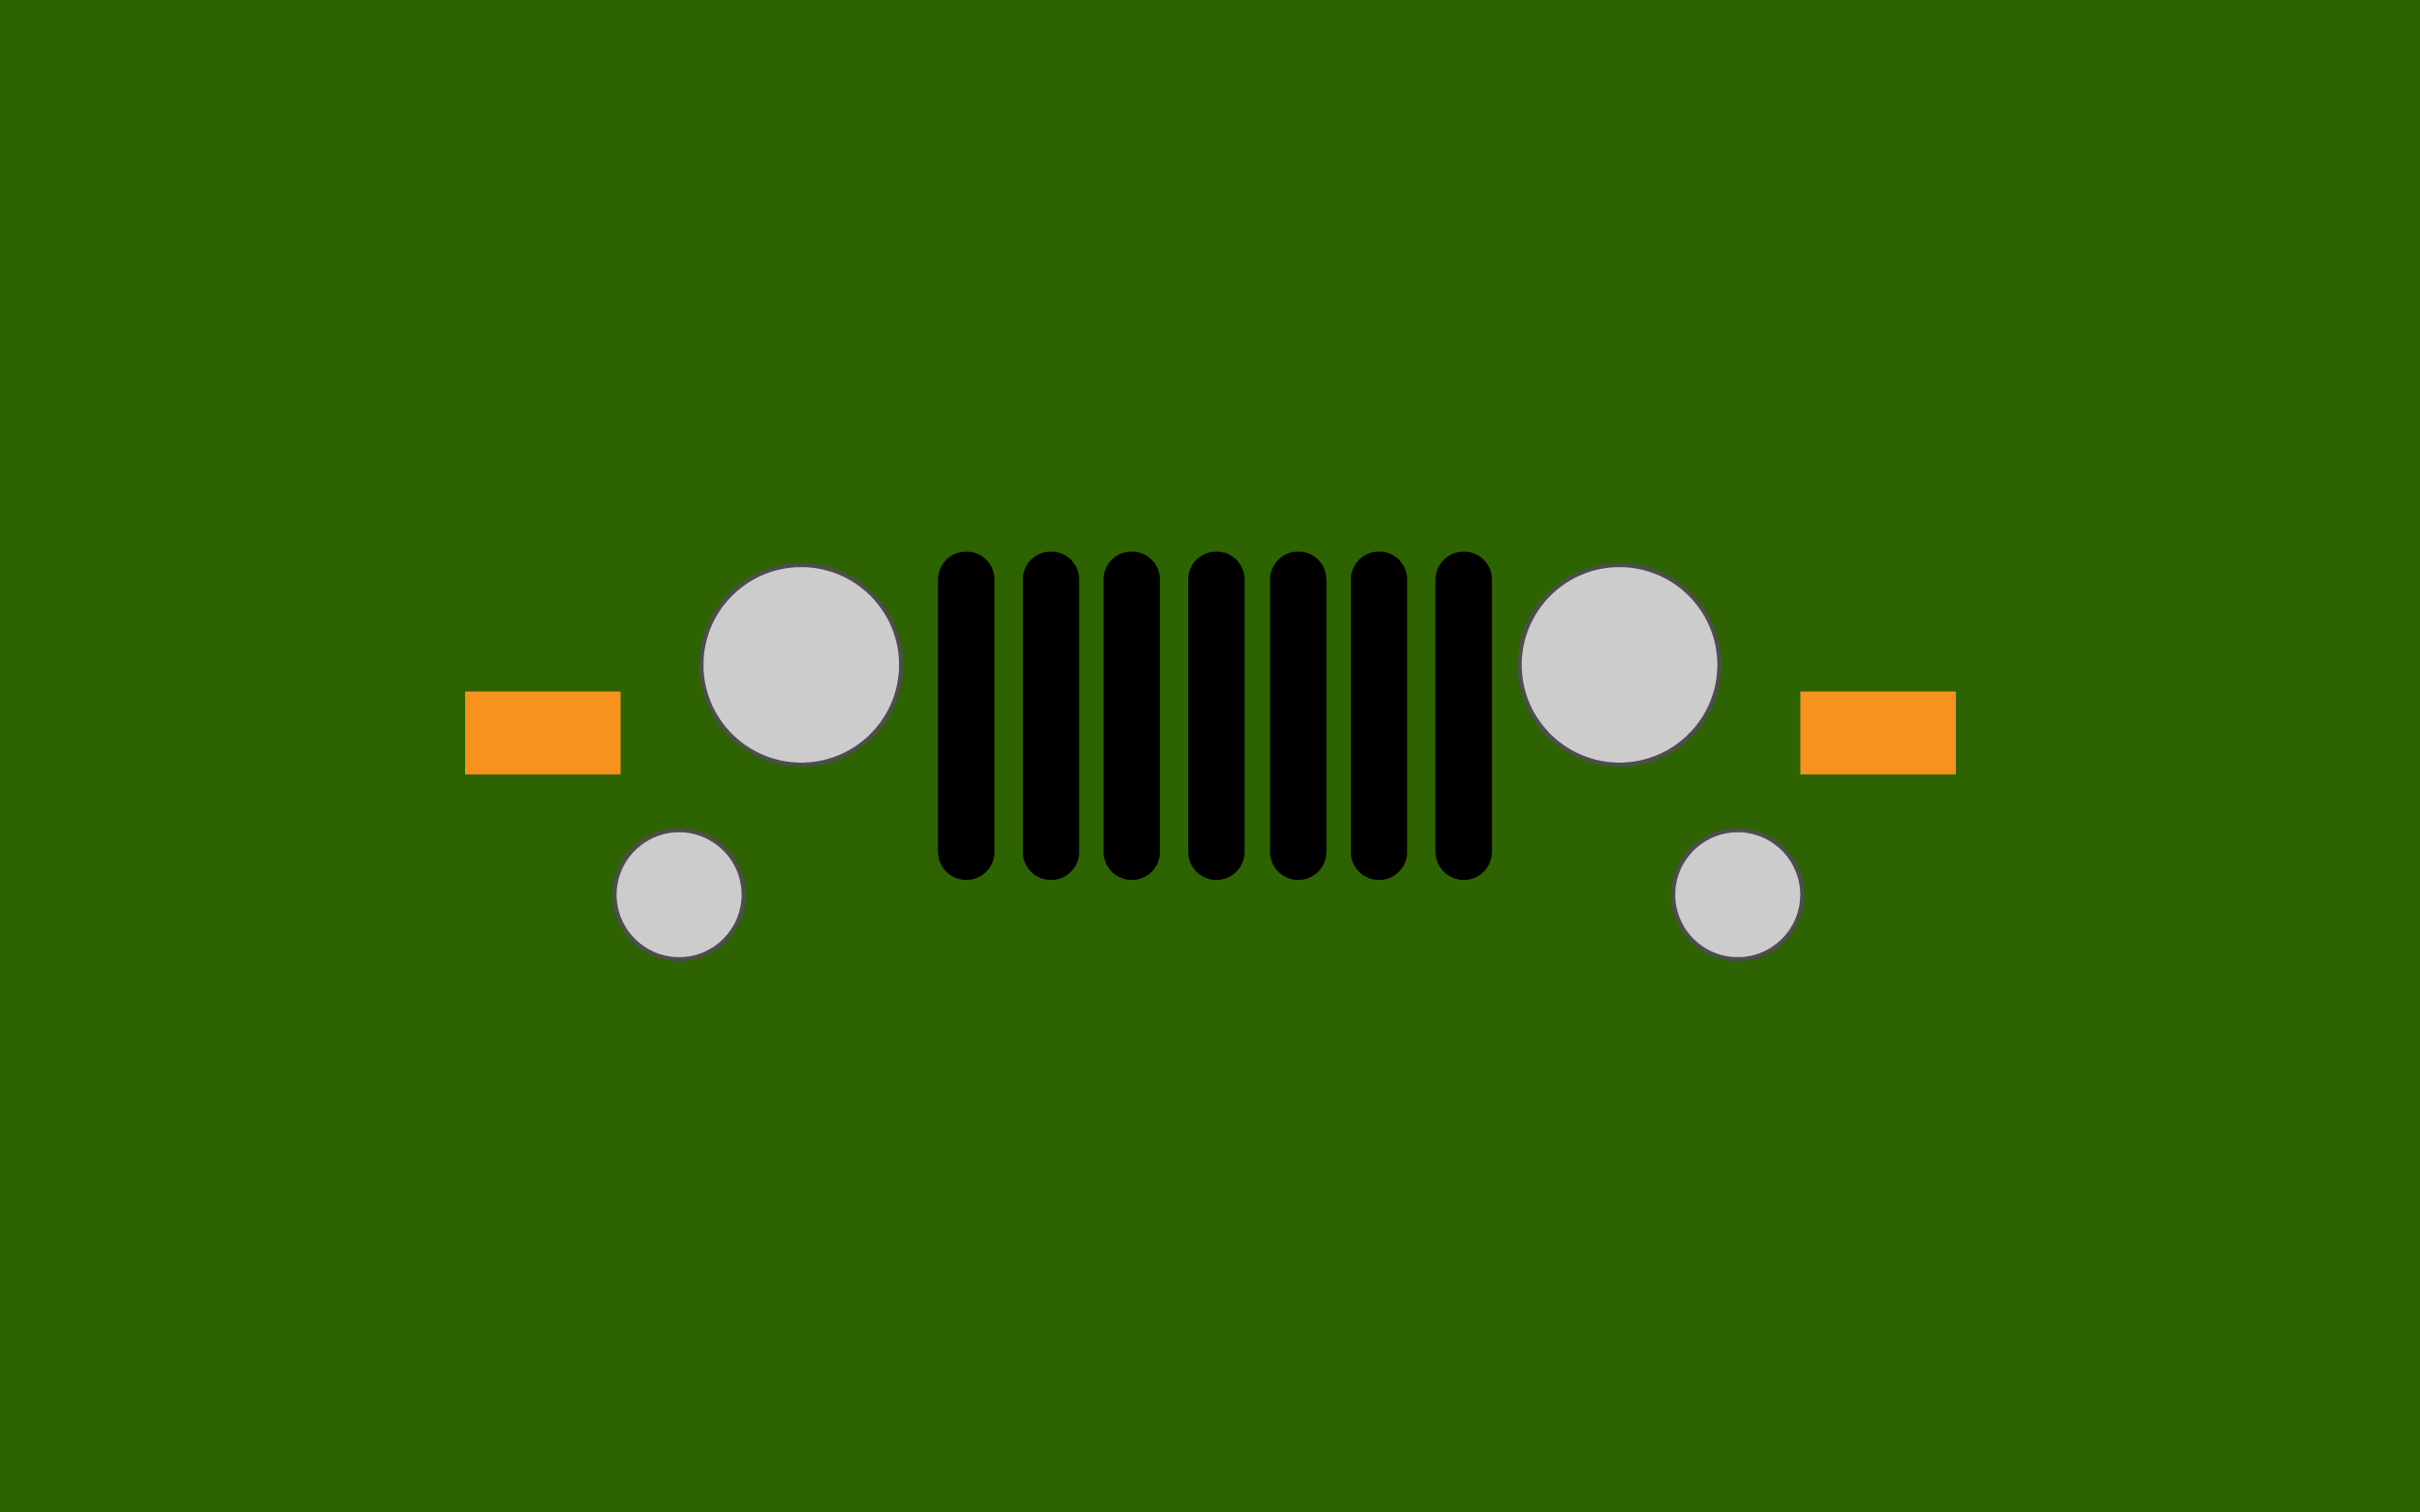 jeep logo background wallpaper 66858